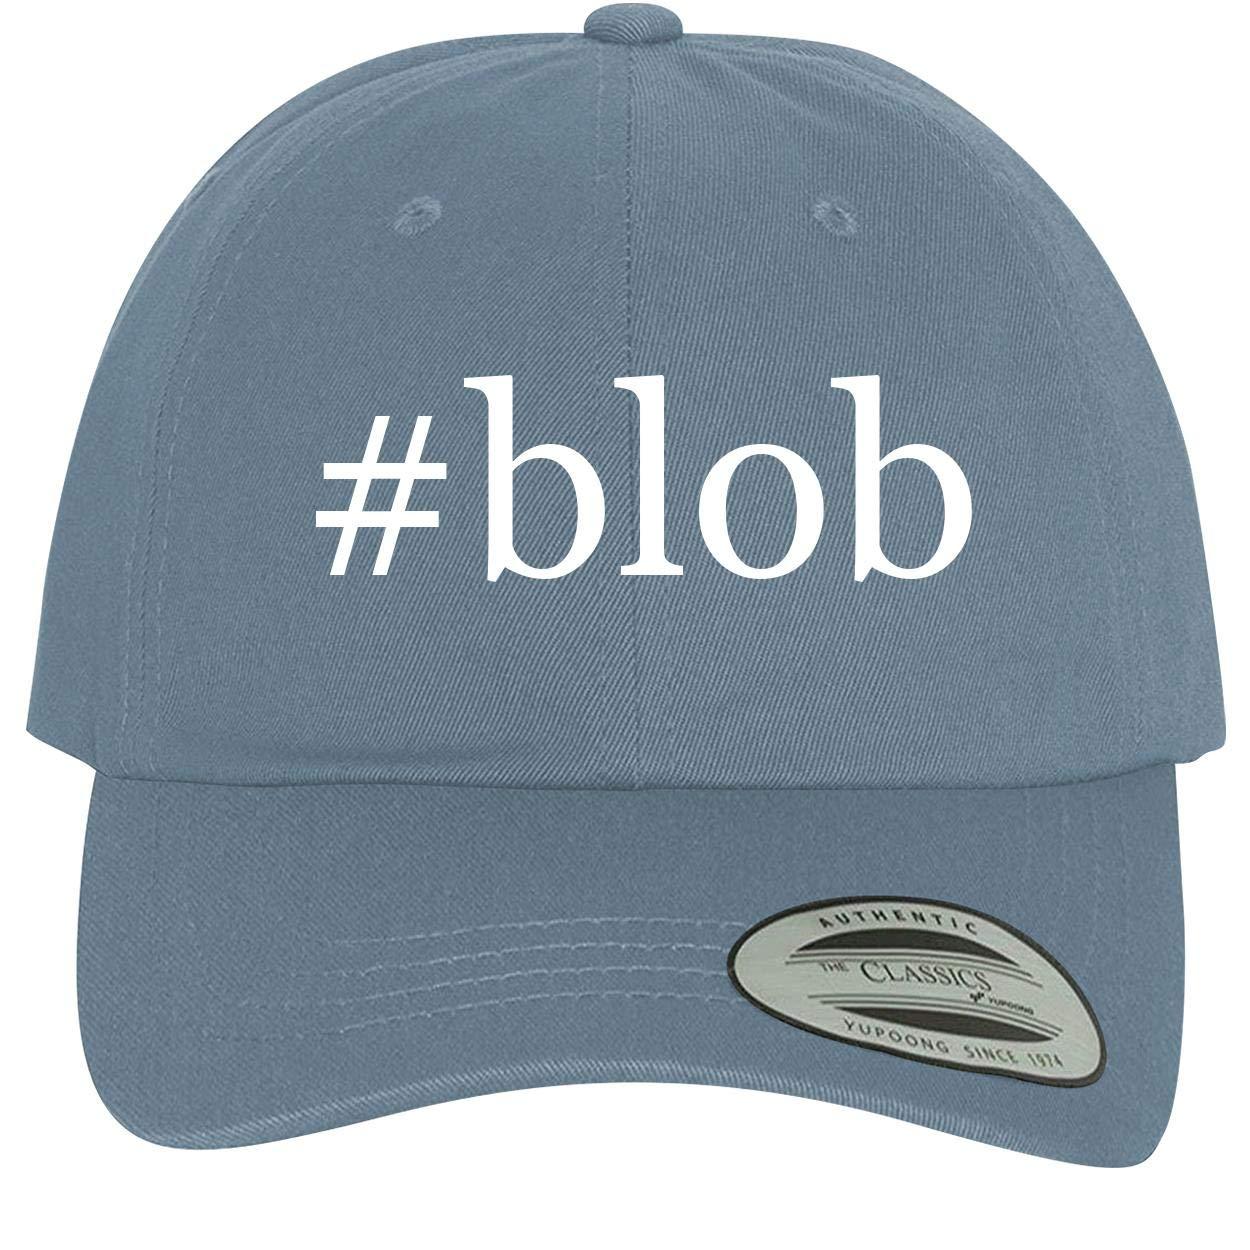 Comfortable Dad Hat Baseball Cap BH Cool Designs #blob